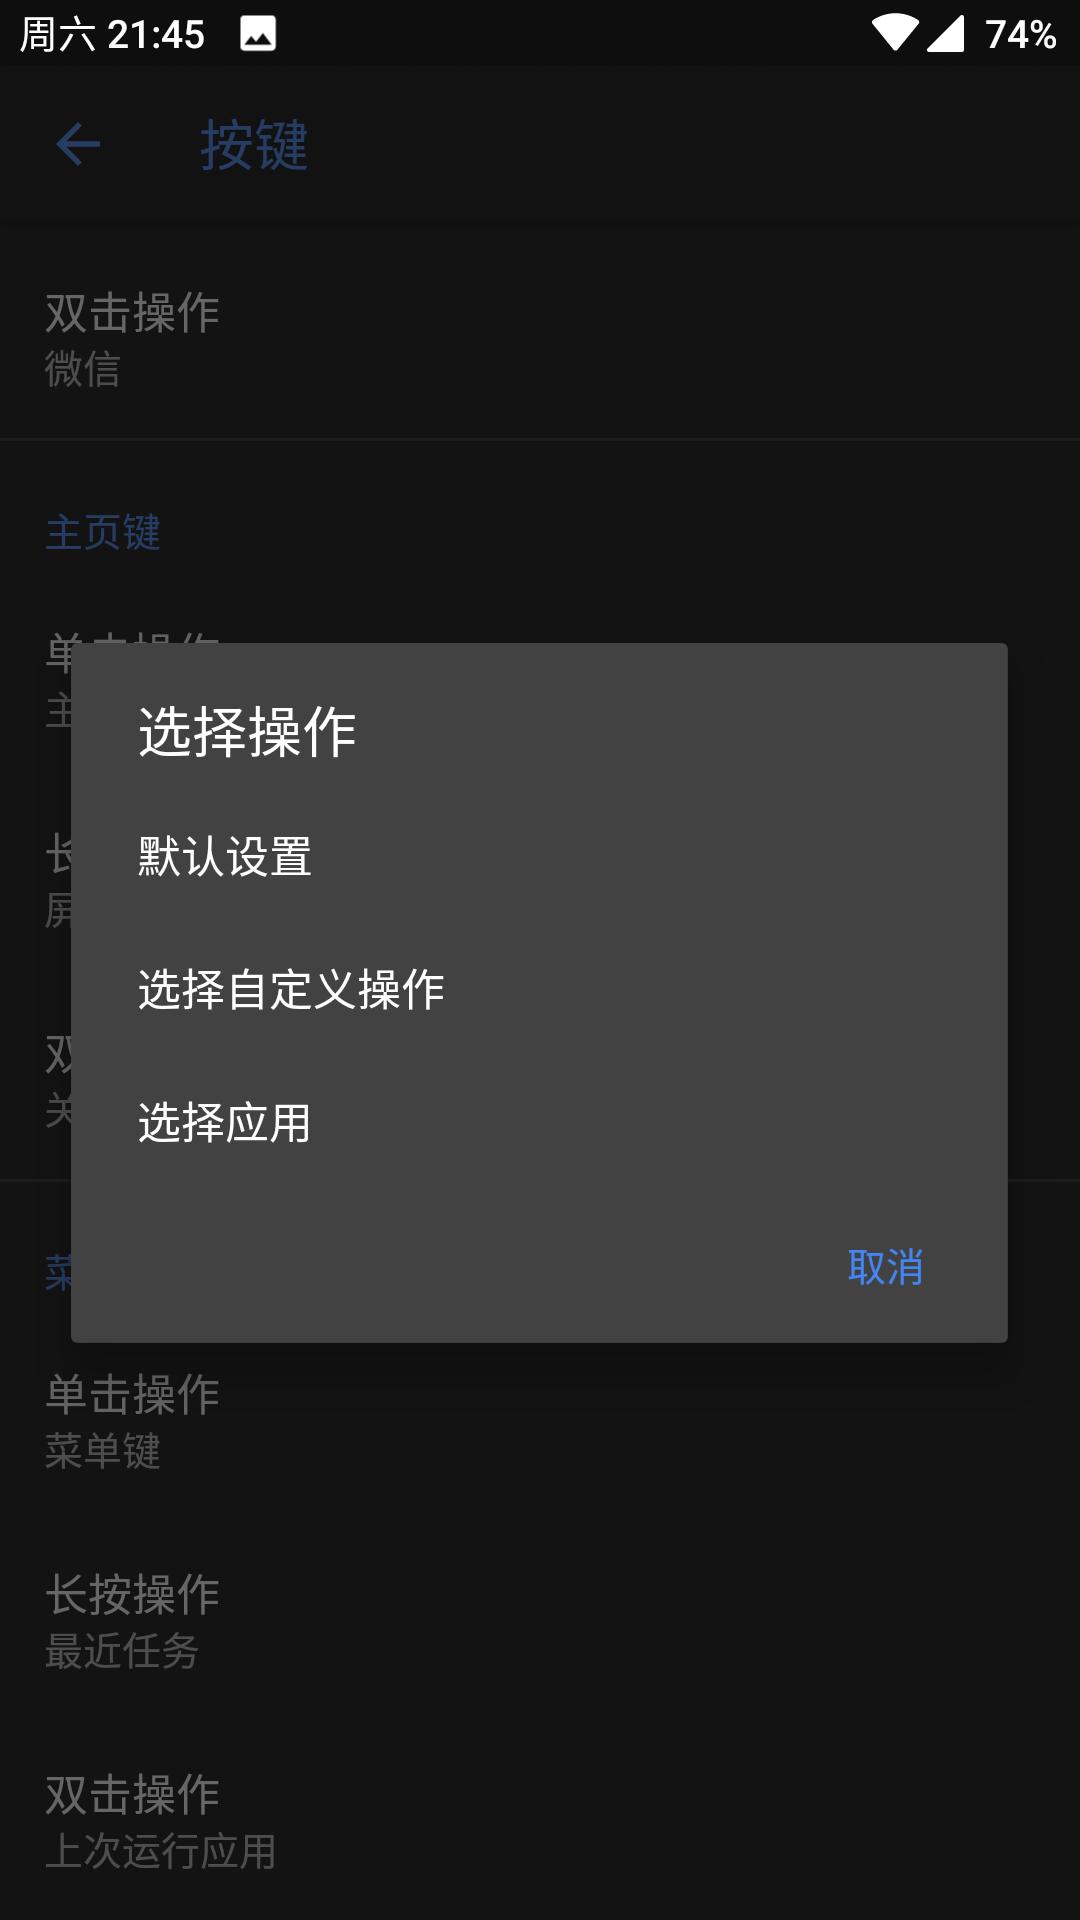 Screenshot_20190126-214520.png